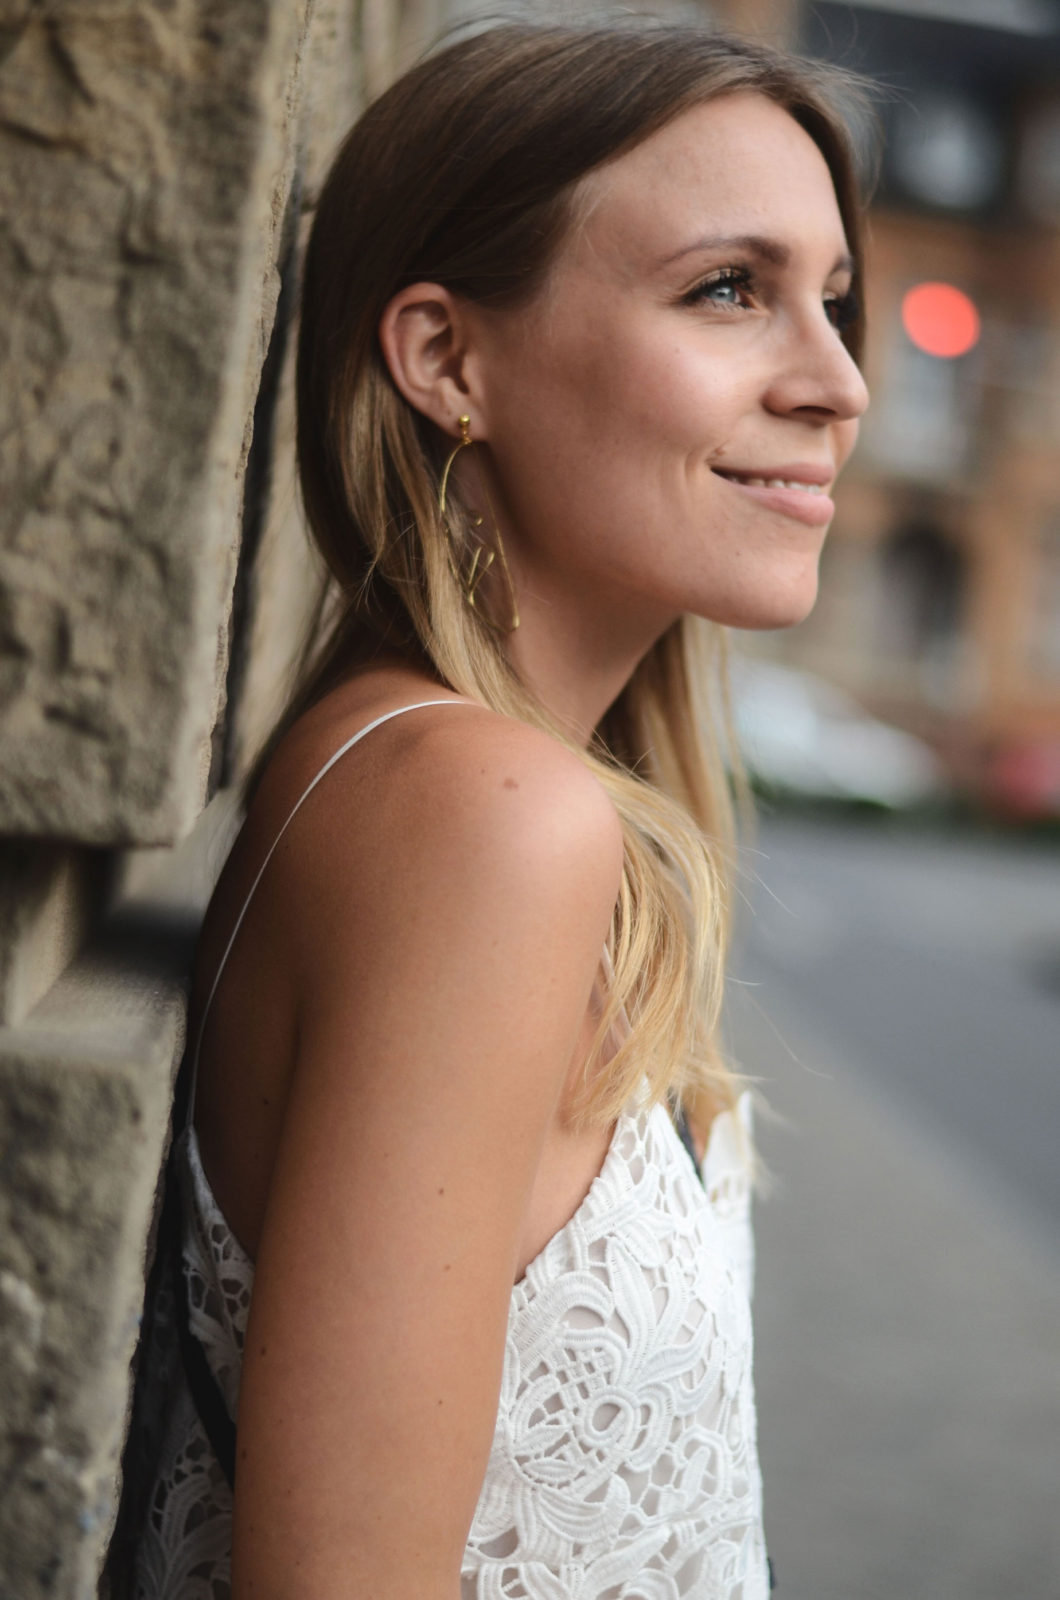 Sariety-modeblog-heidelberg-sarah-czok-fashionblogger-zara-spitzenkleid-superga-aldo-bag-11